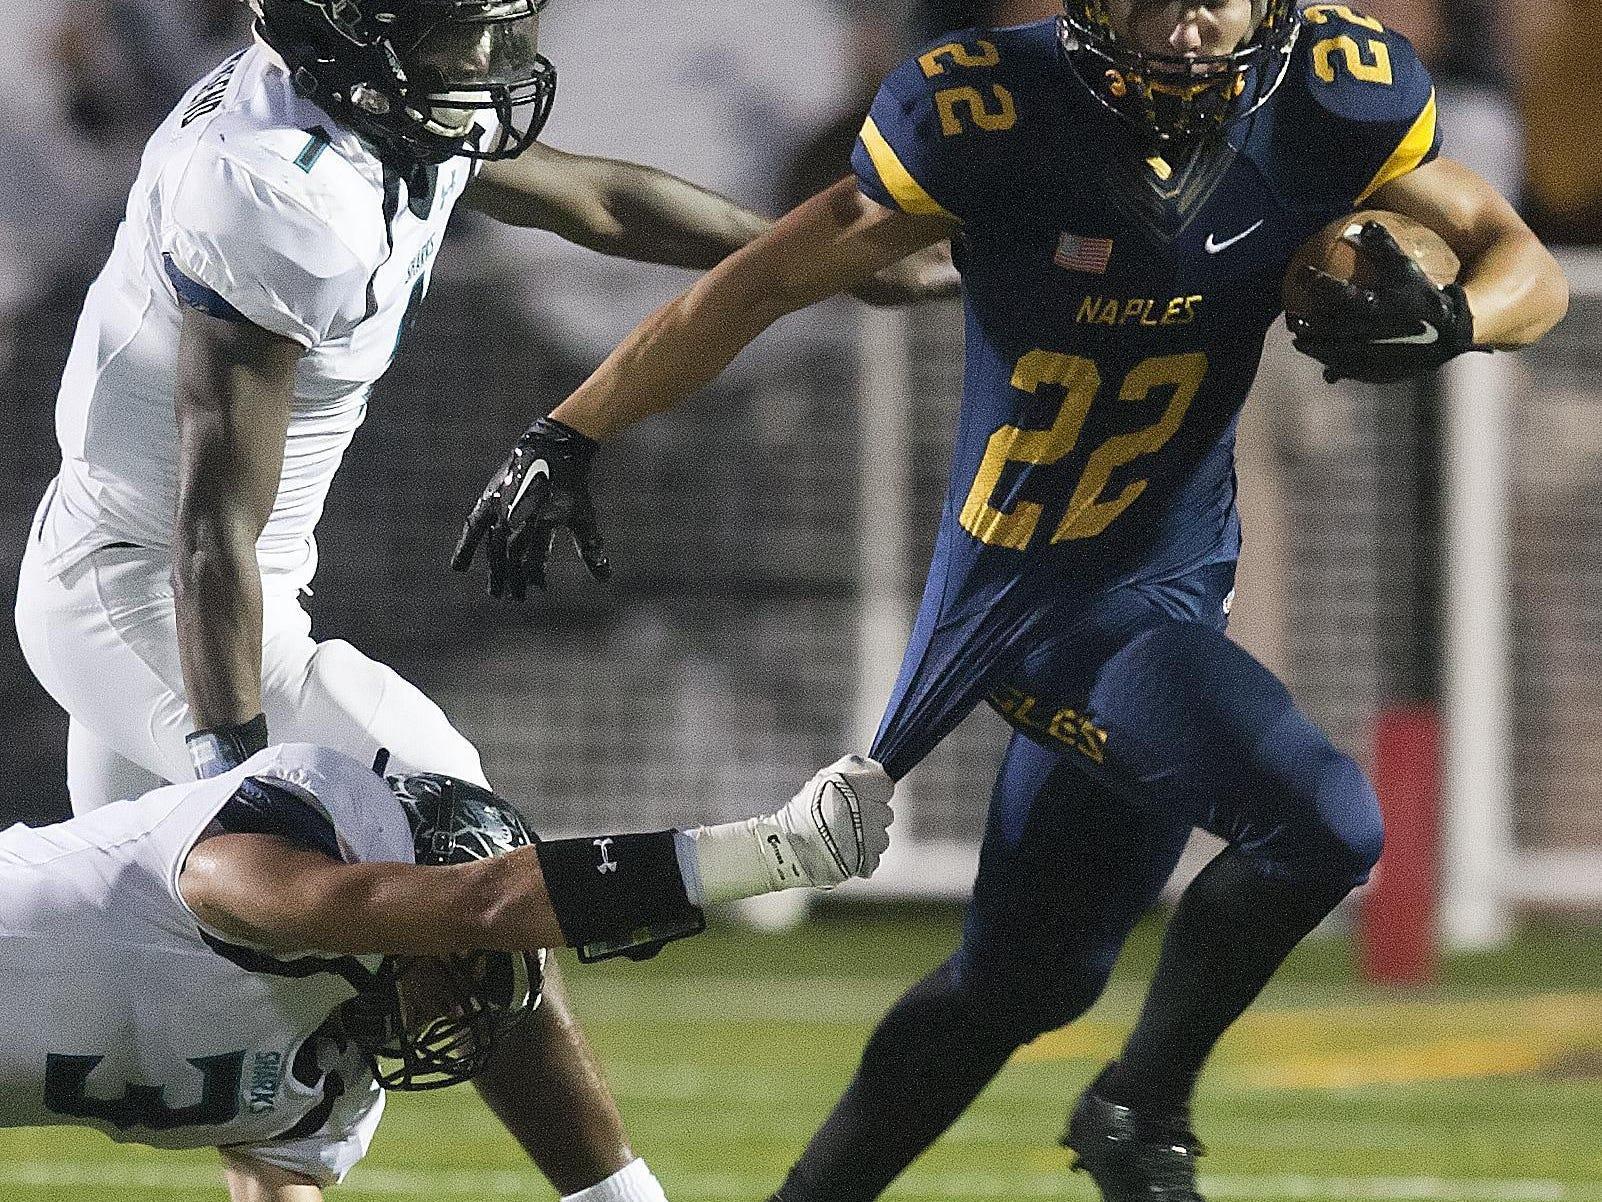 Naples High School's Antonio Carbonaro gains a firt down against Gulf Coast on Friday at Naples High School.